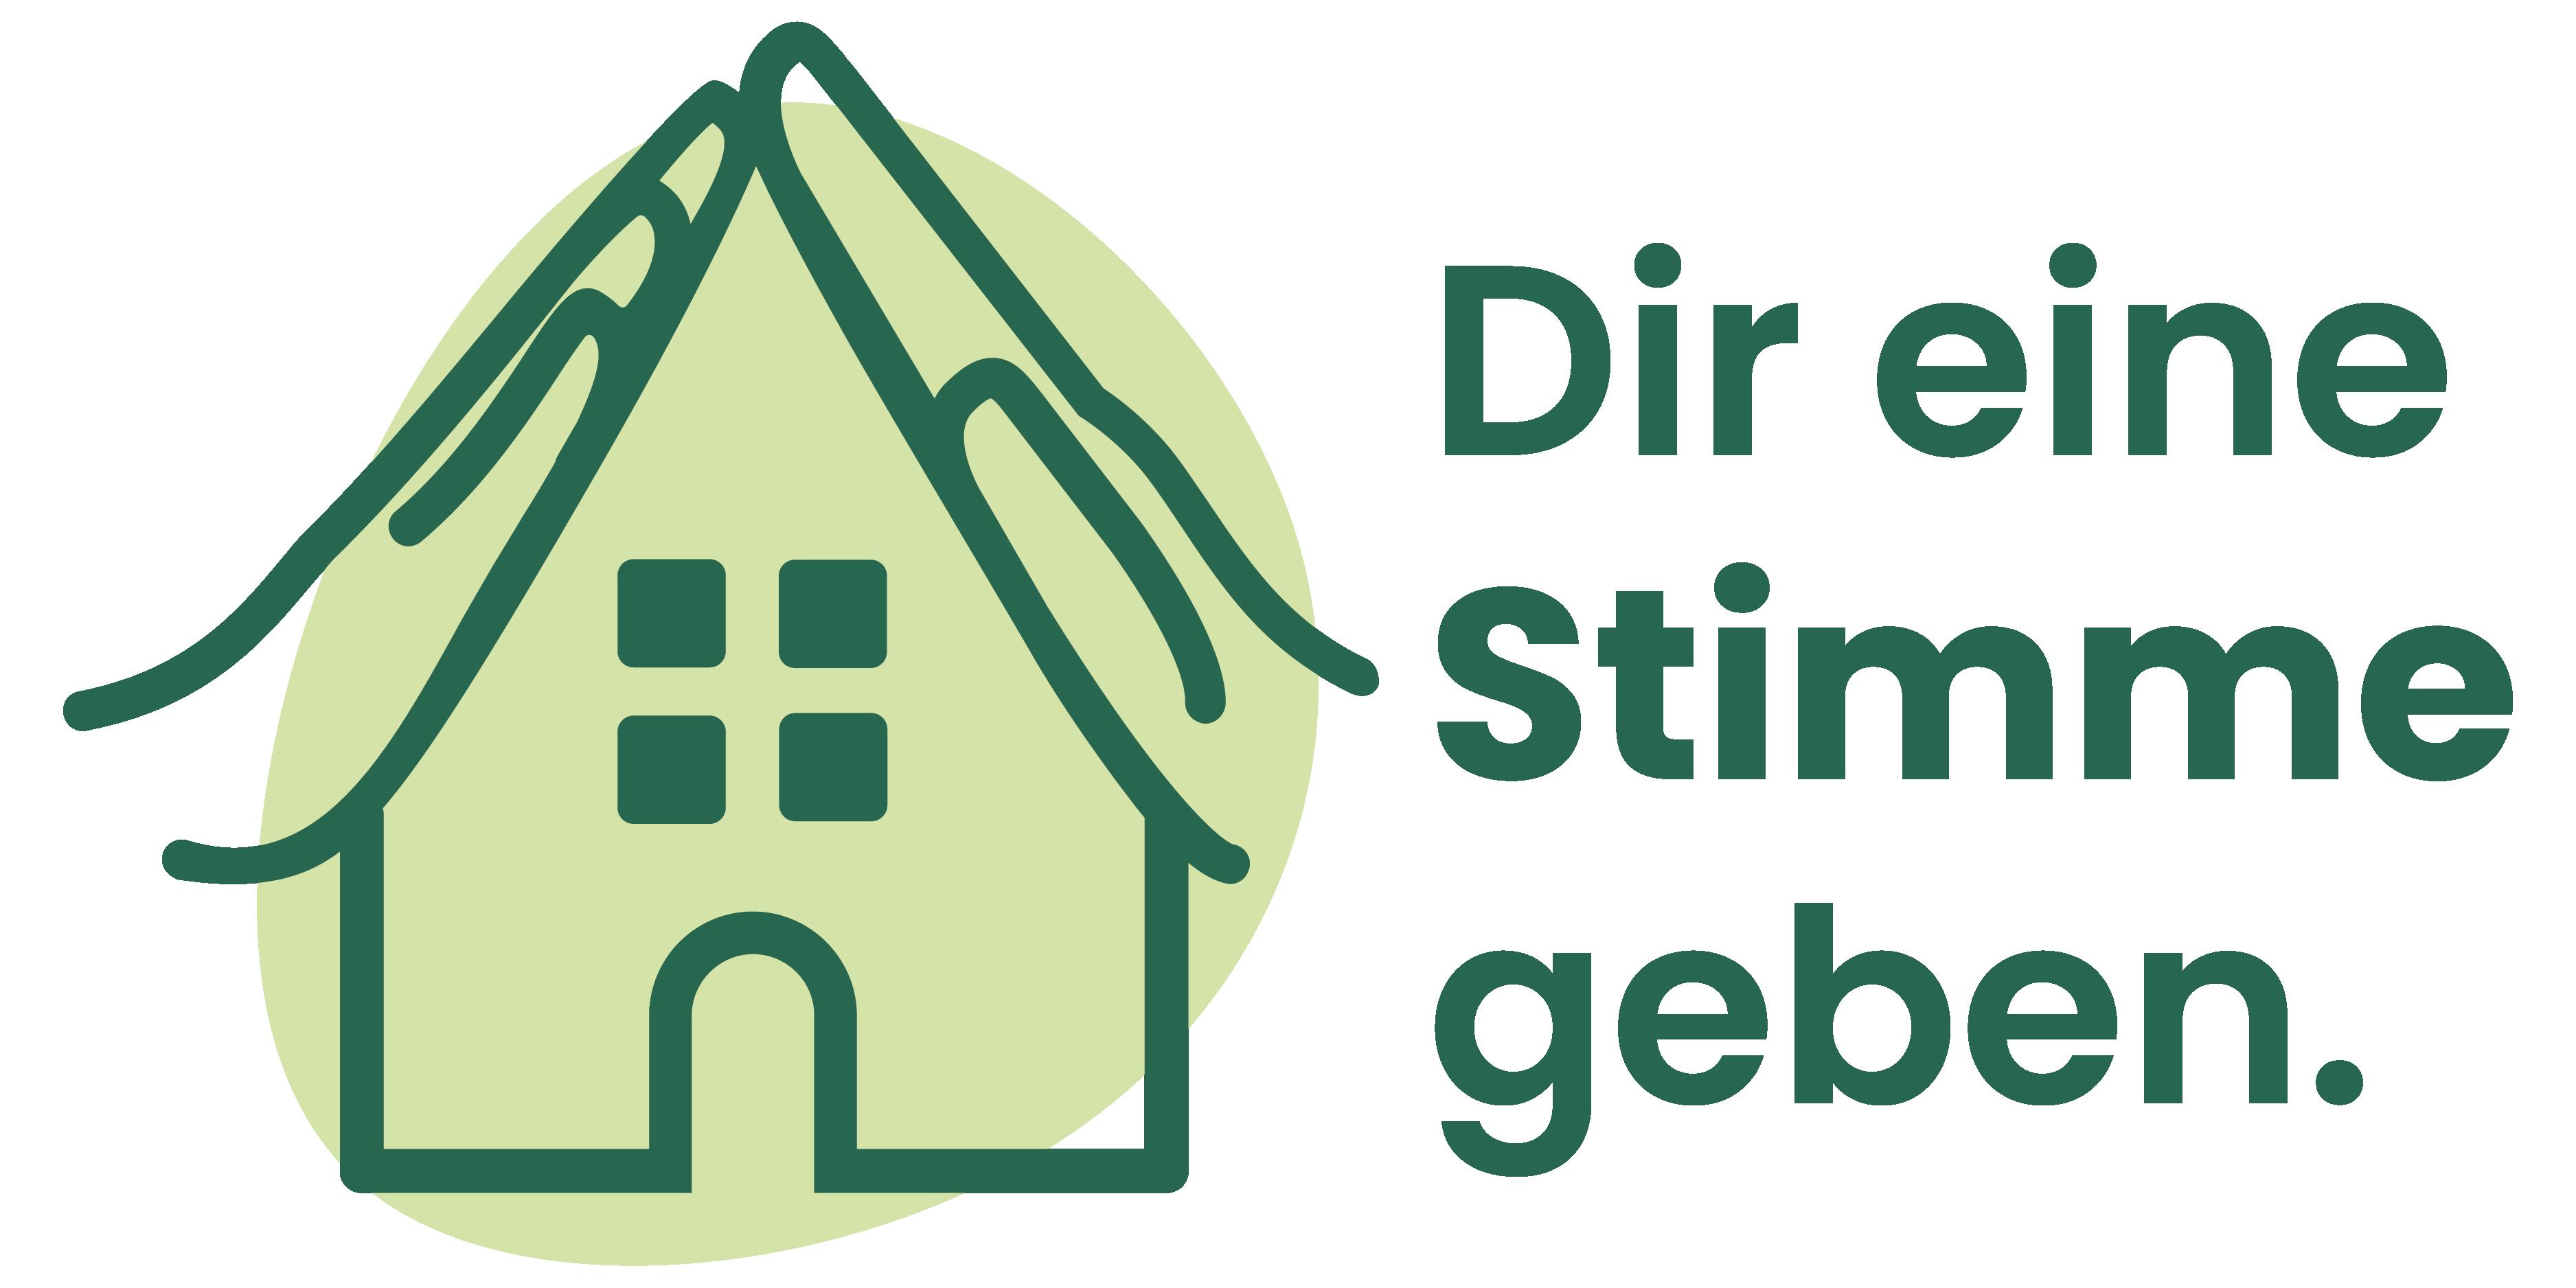 young-helping-hands logo+unterzeile 2020